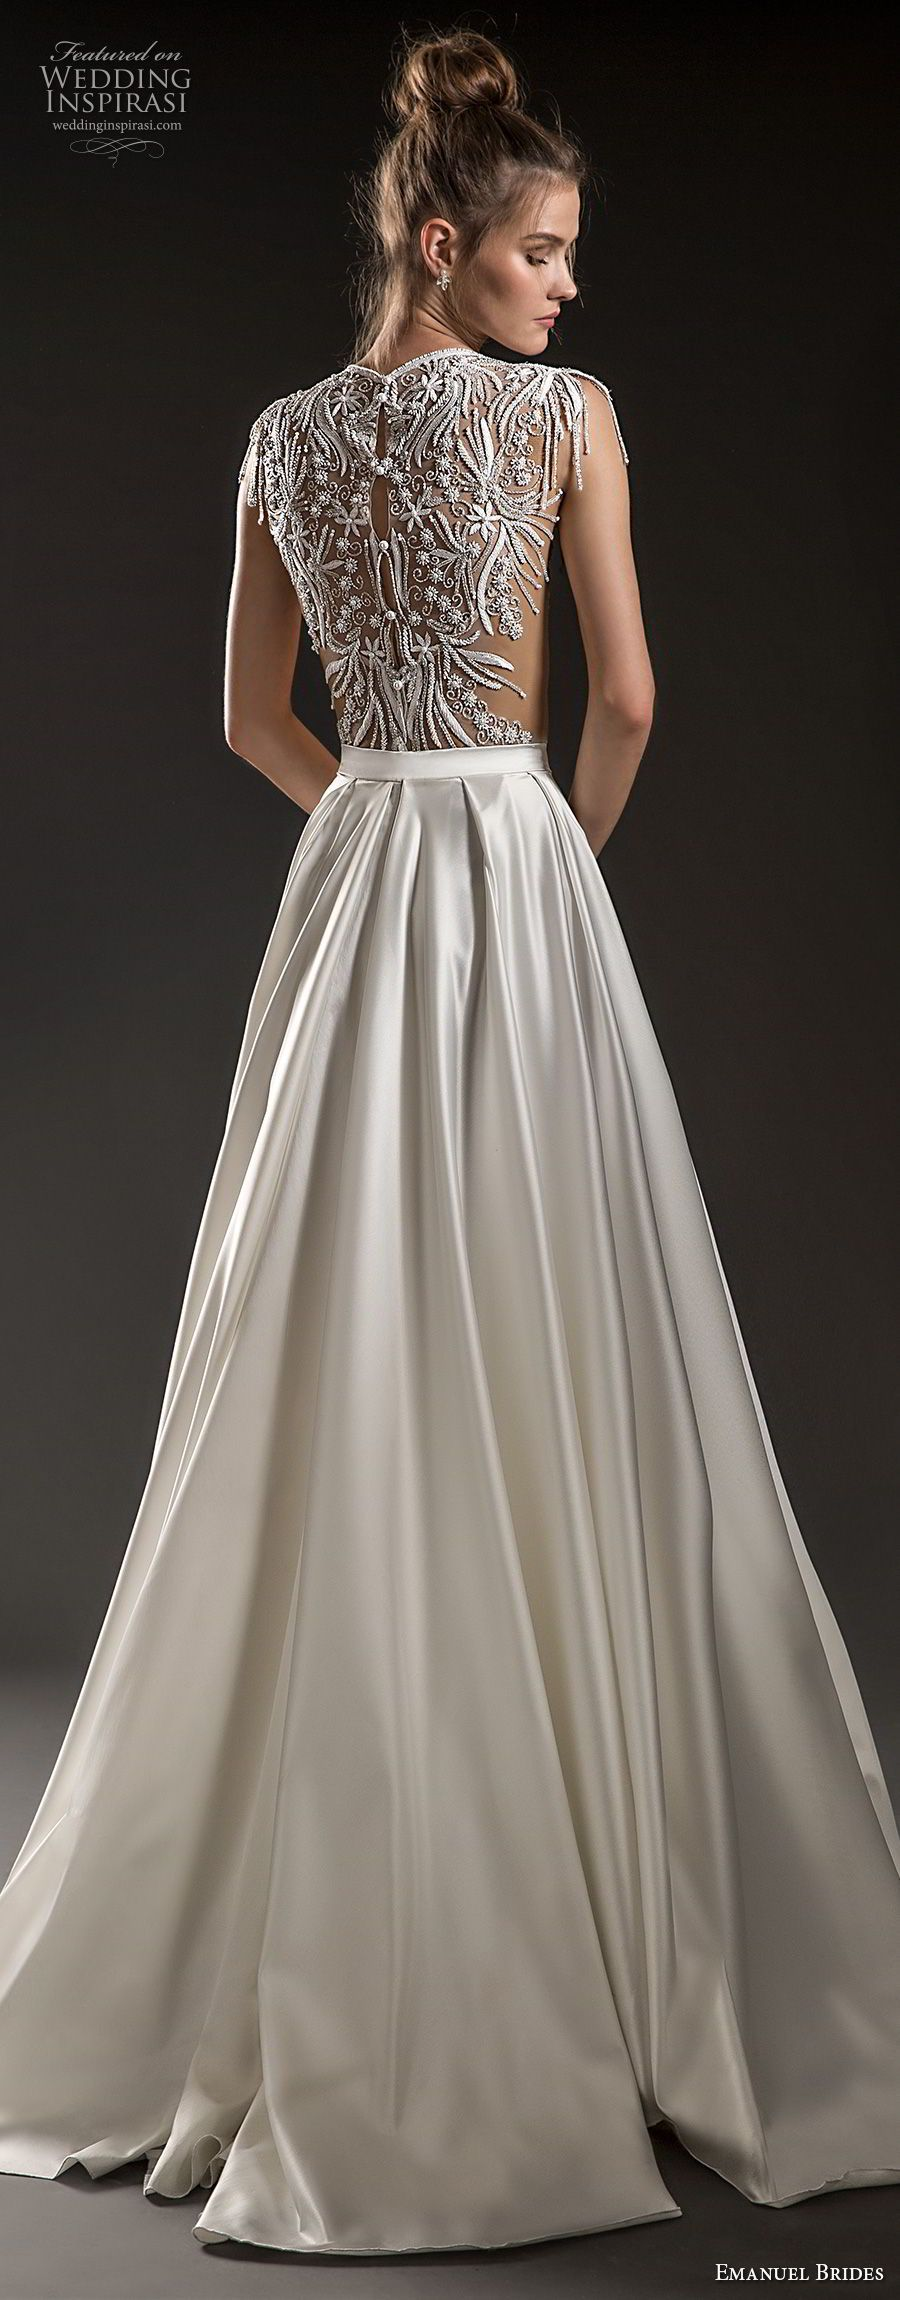 Emanuel brides wedding dresses wedding trends pinterest